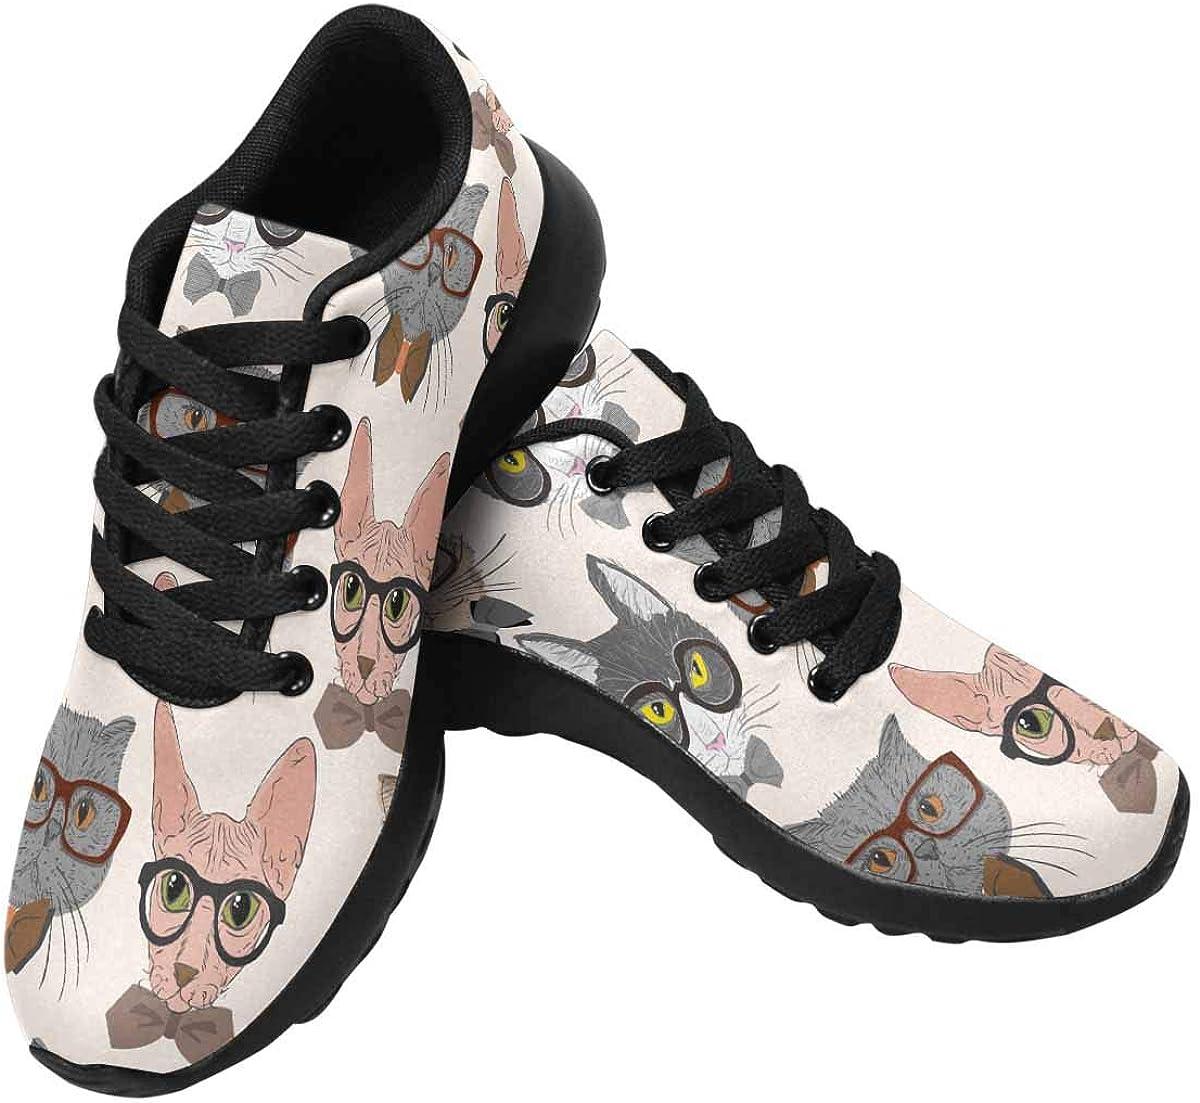 InterestPrint Women's Running Shoes Breatha 買い物 特価品コーナー☆ Non-Slip Lightweight